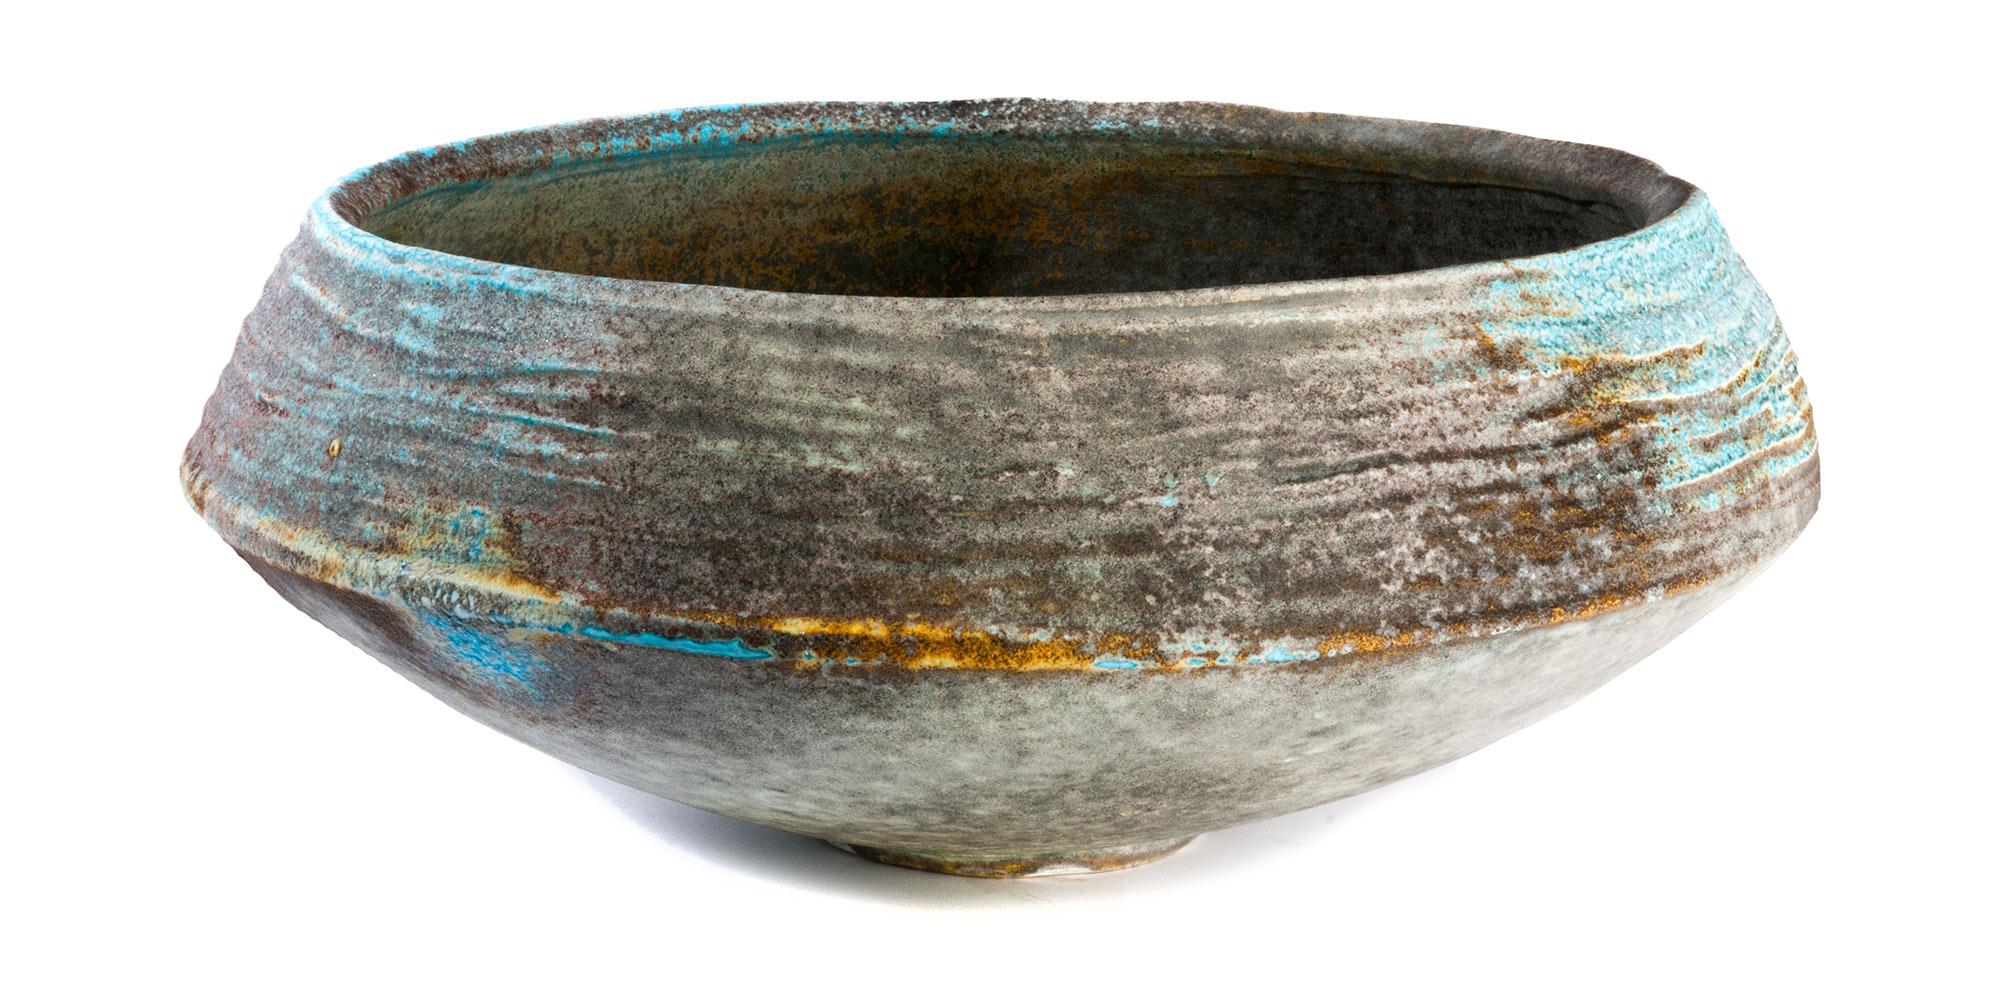 doherty-porcelain-profile-Carved-Vessel-tidy.jpg